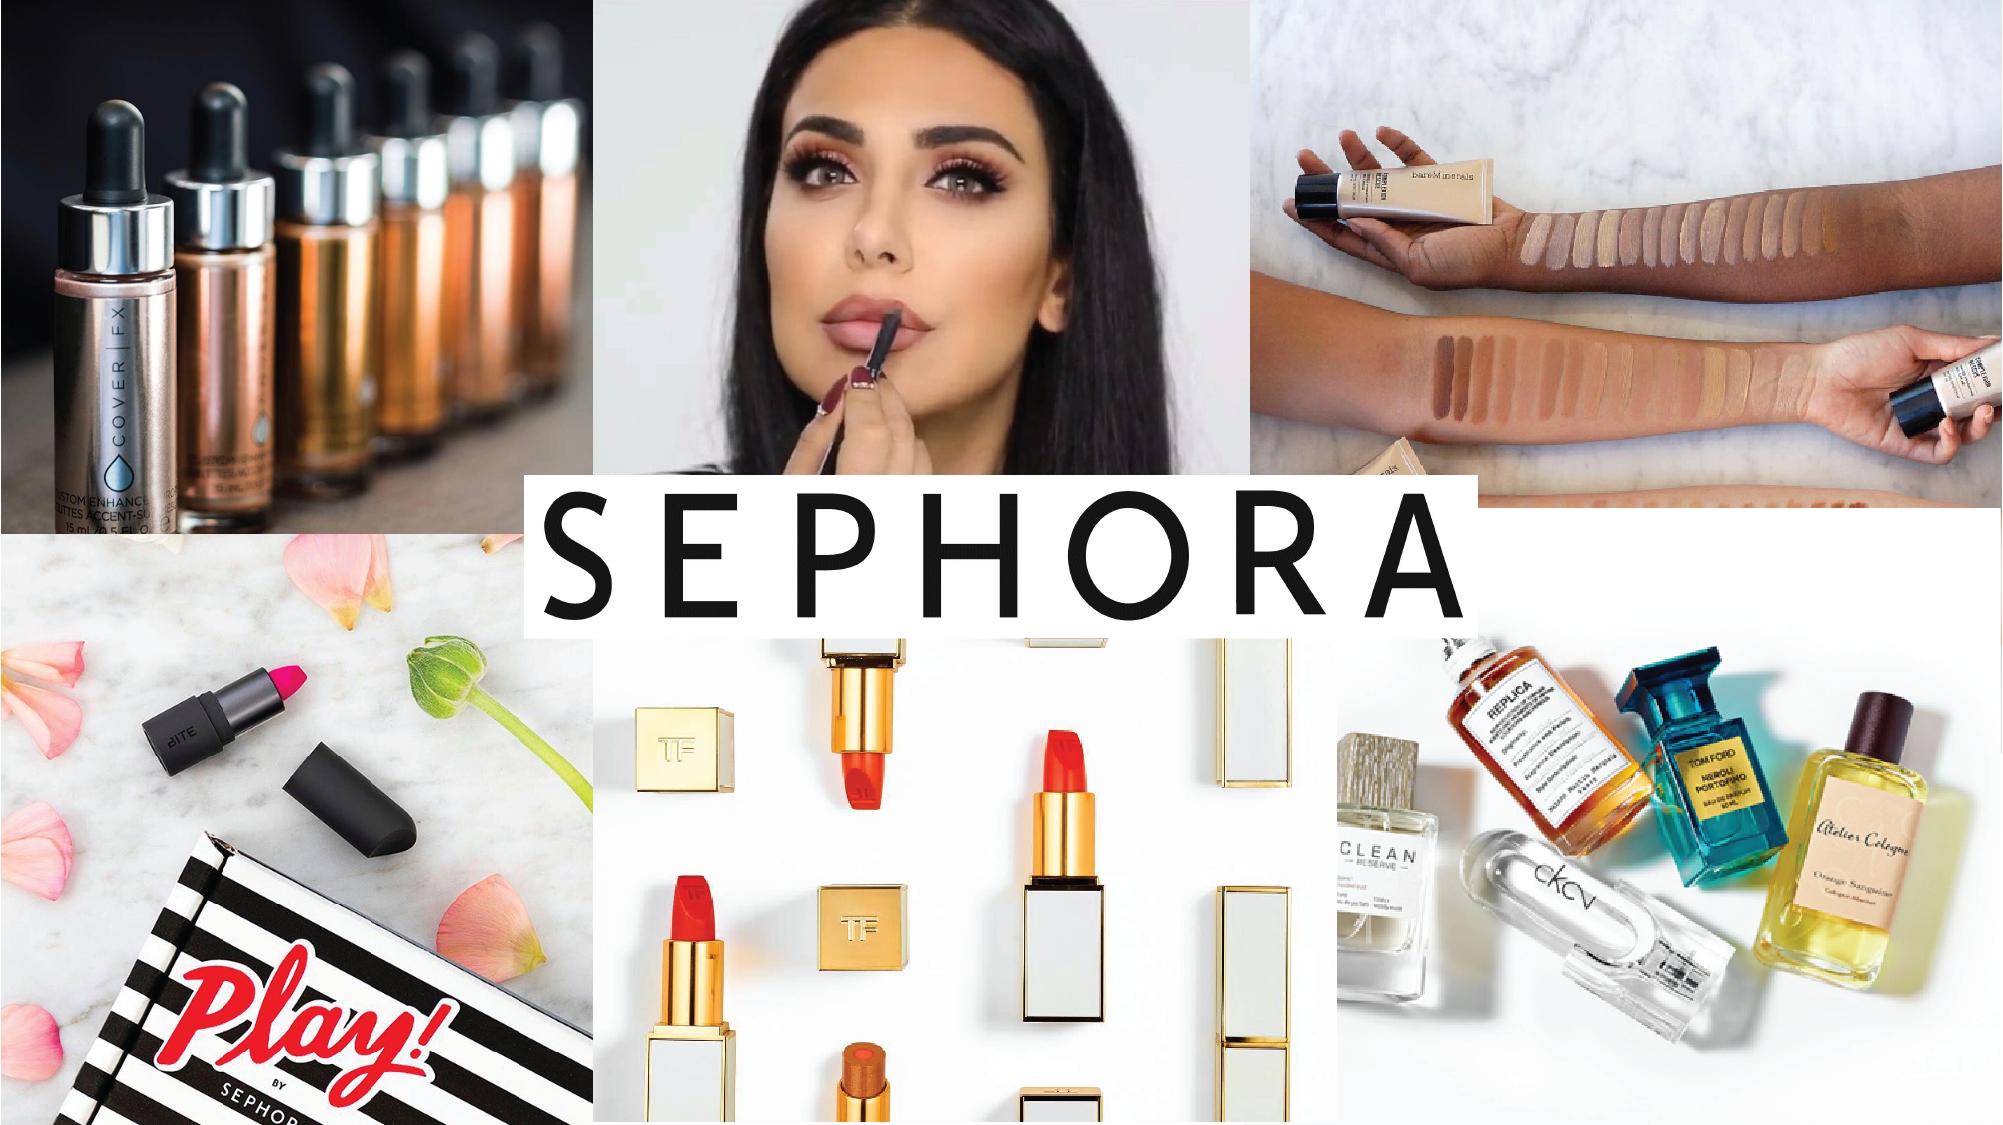 Sephora Social Branding.png